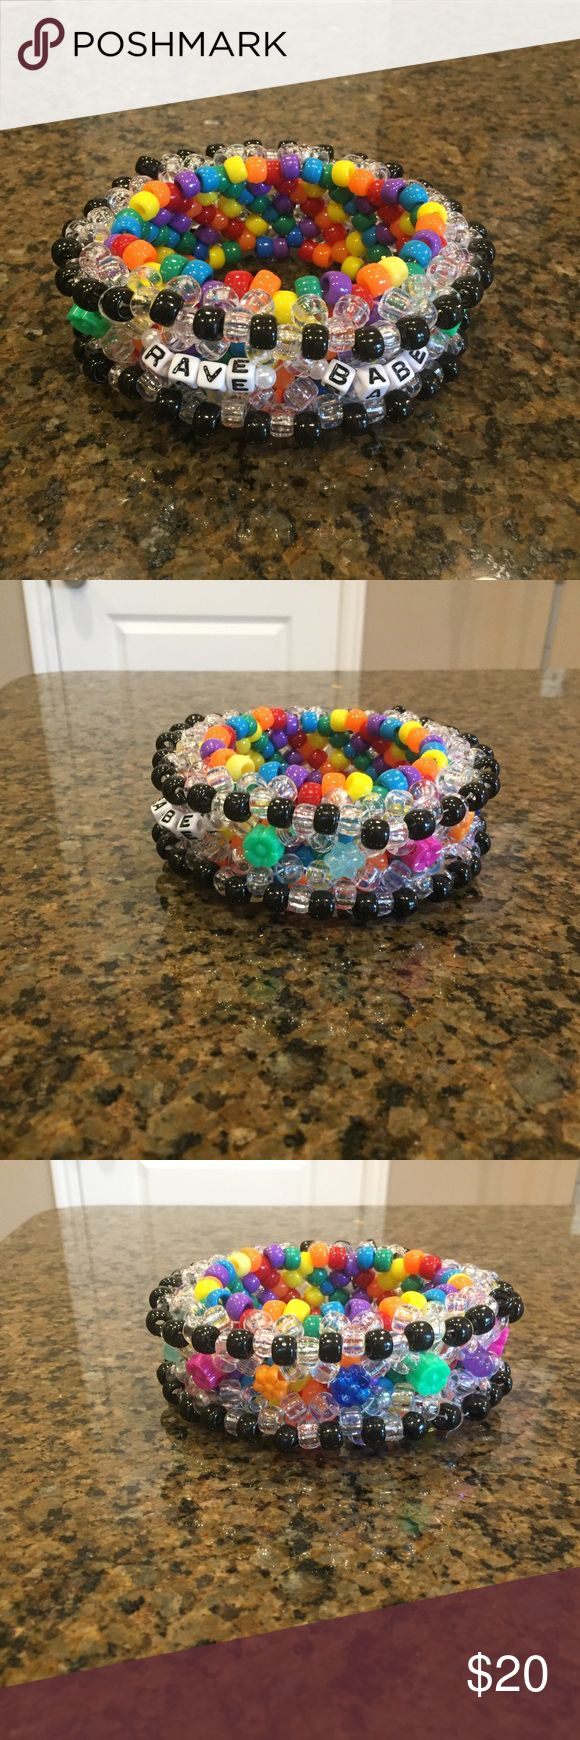 "Rave babe kandi cuff Rainbow, flower, ""rave babe"" kandi cuff ✨ festival/rave wear Accessories"